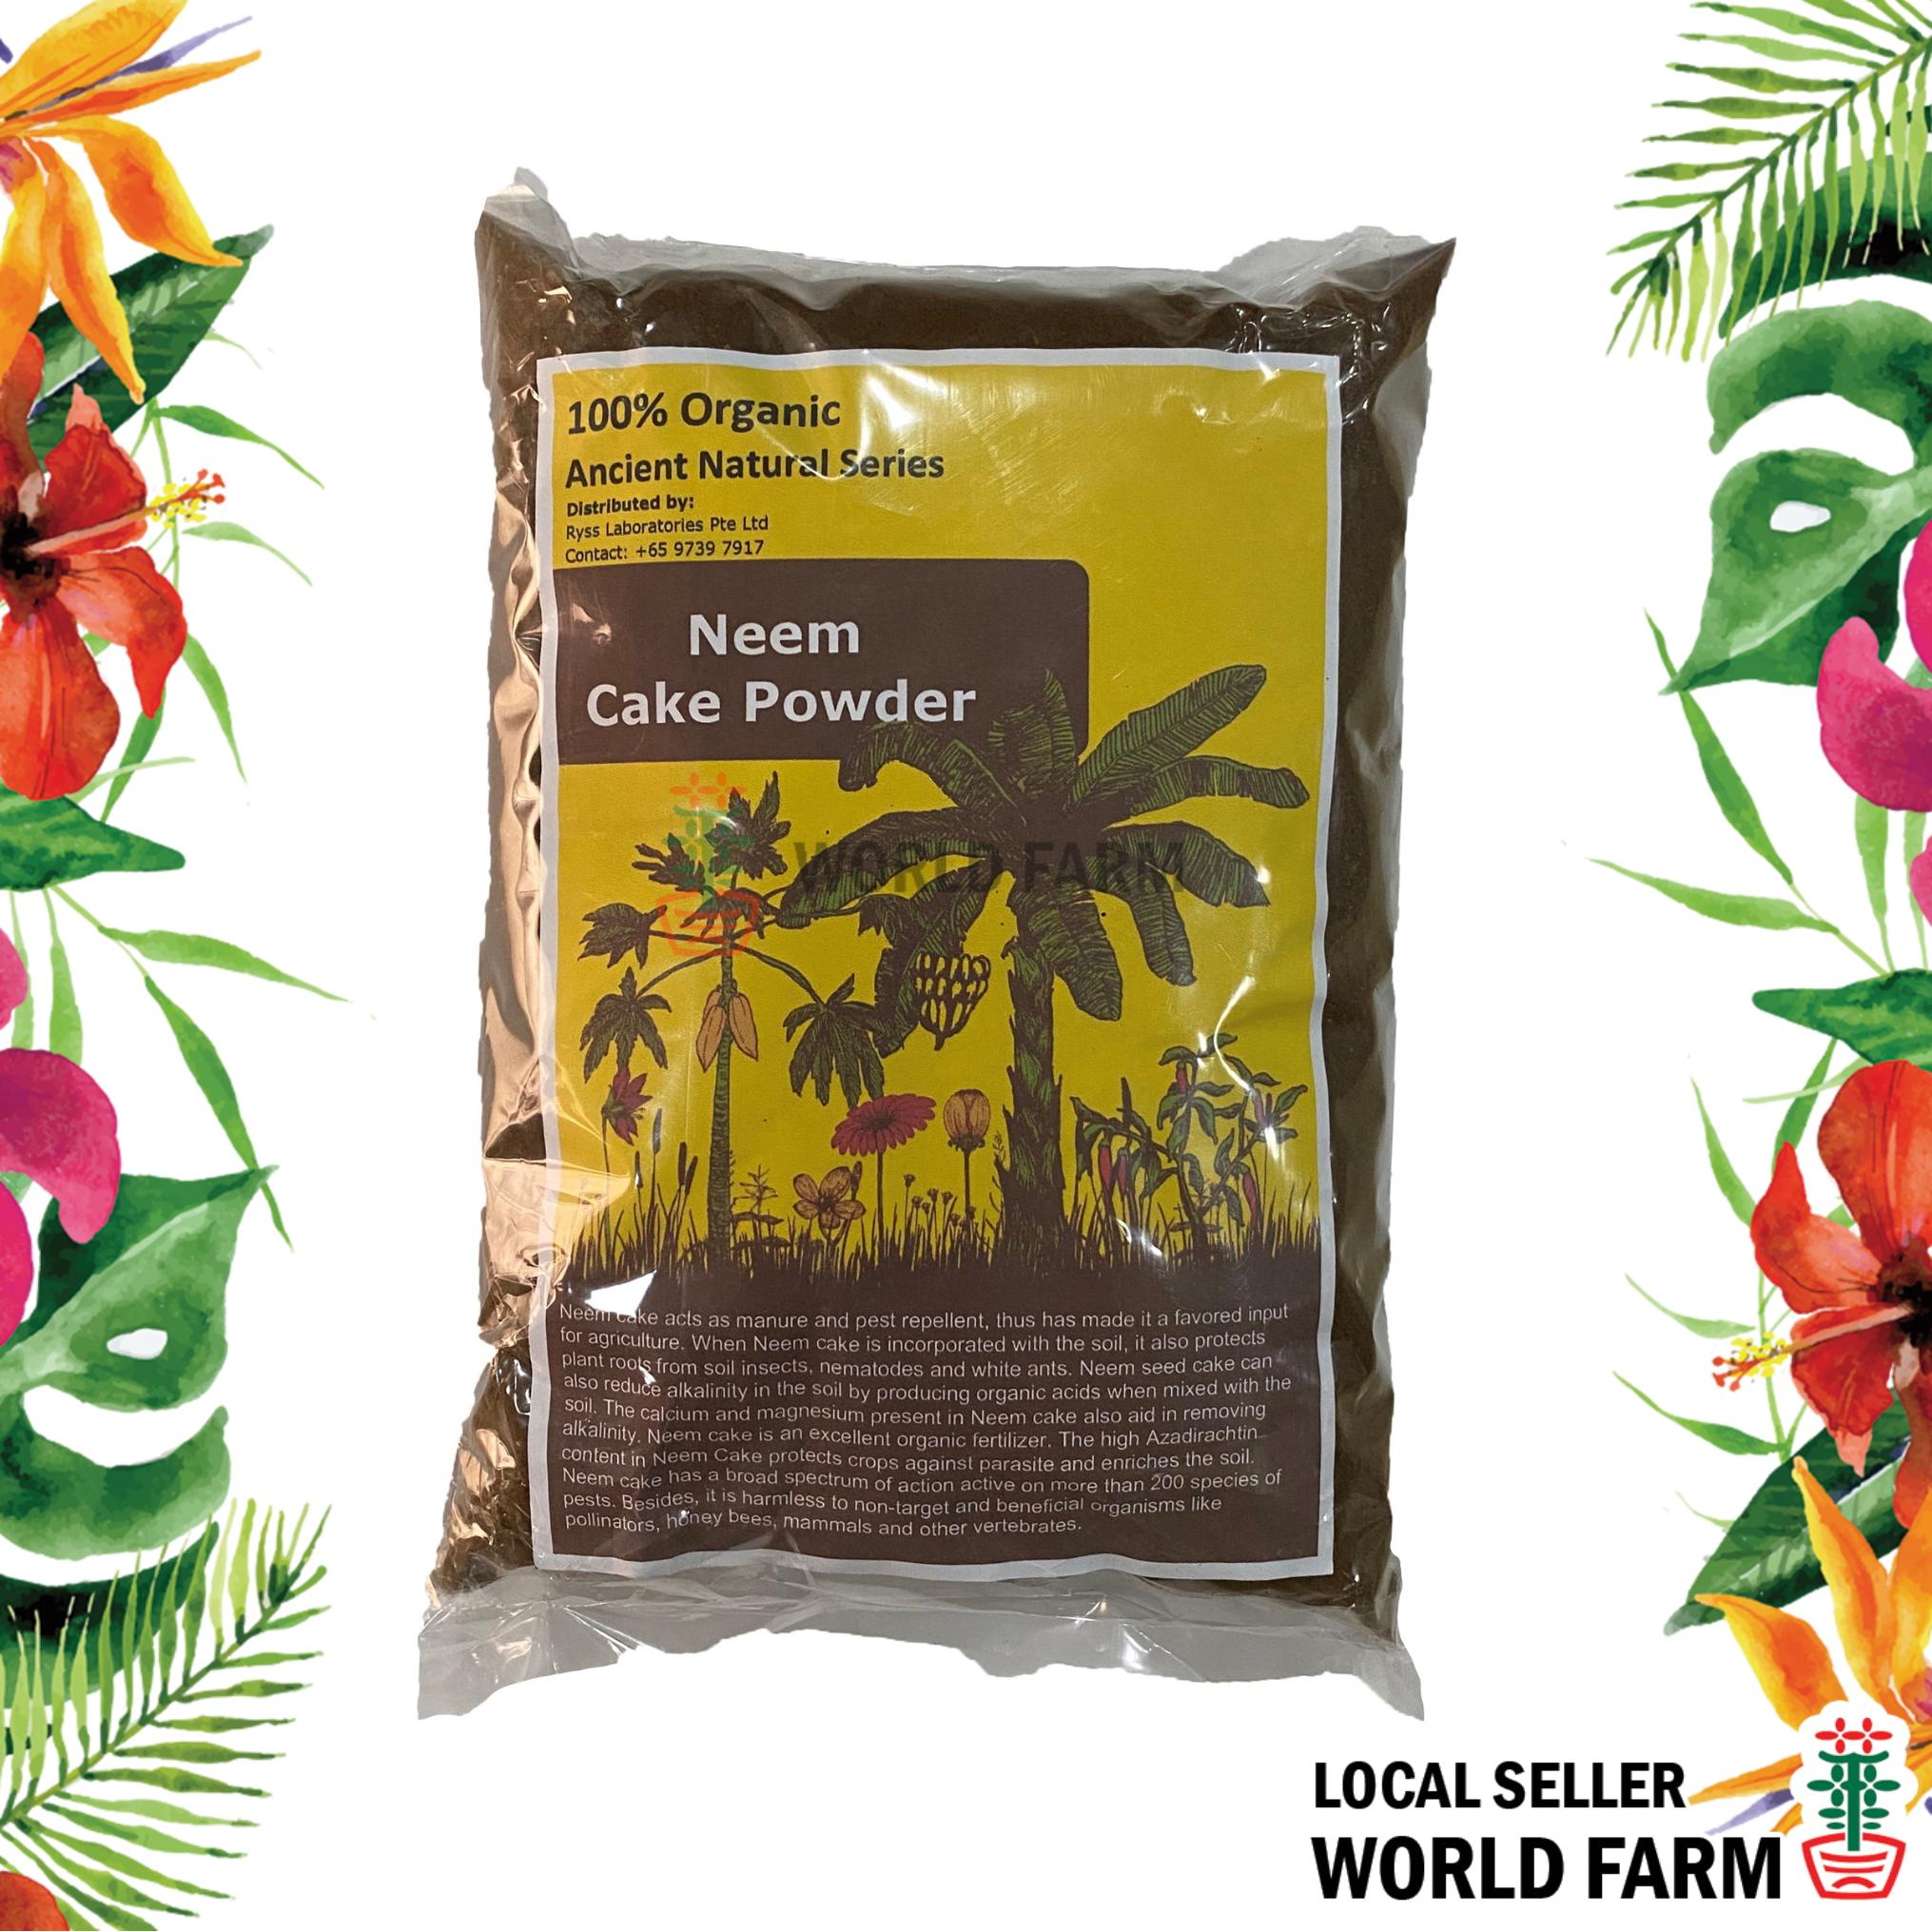 100% Organic Neem Cake Powder 1kg